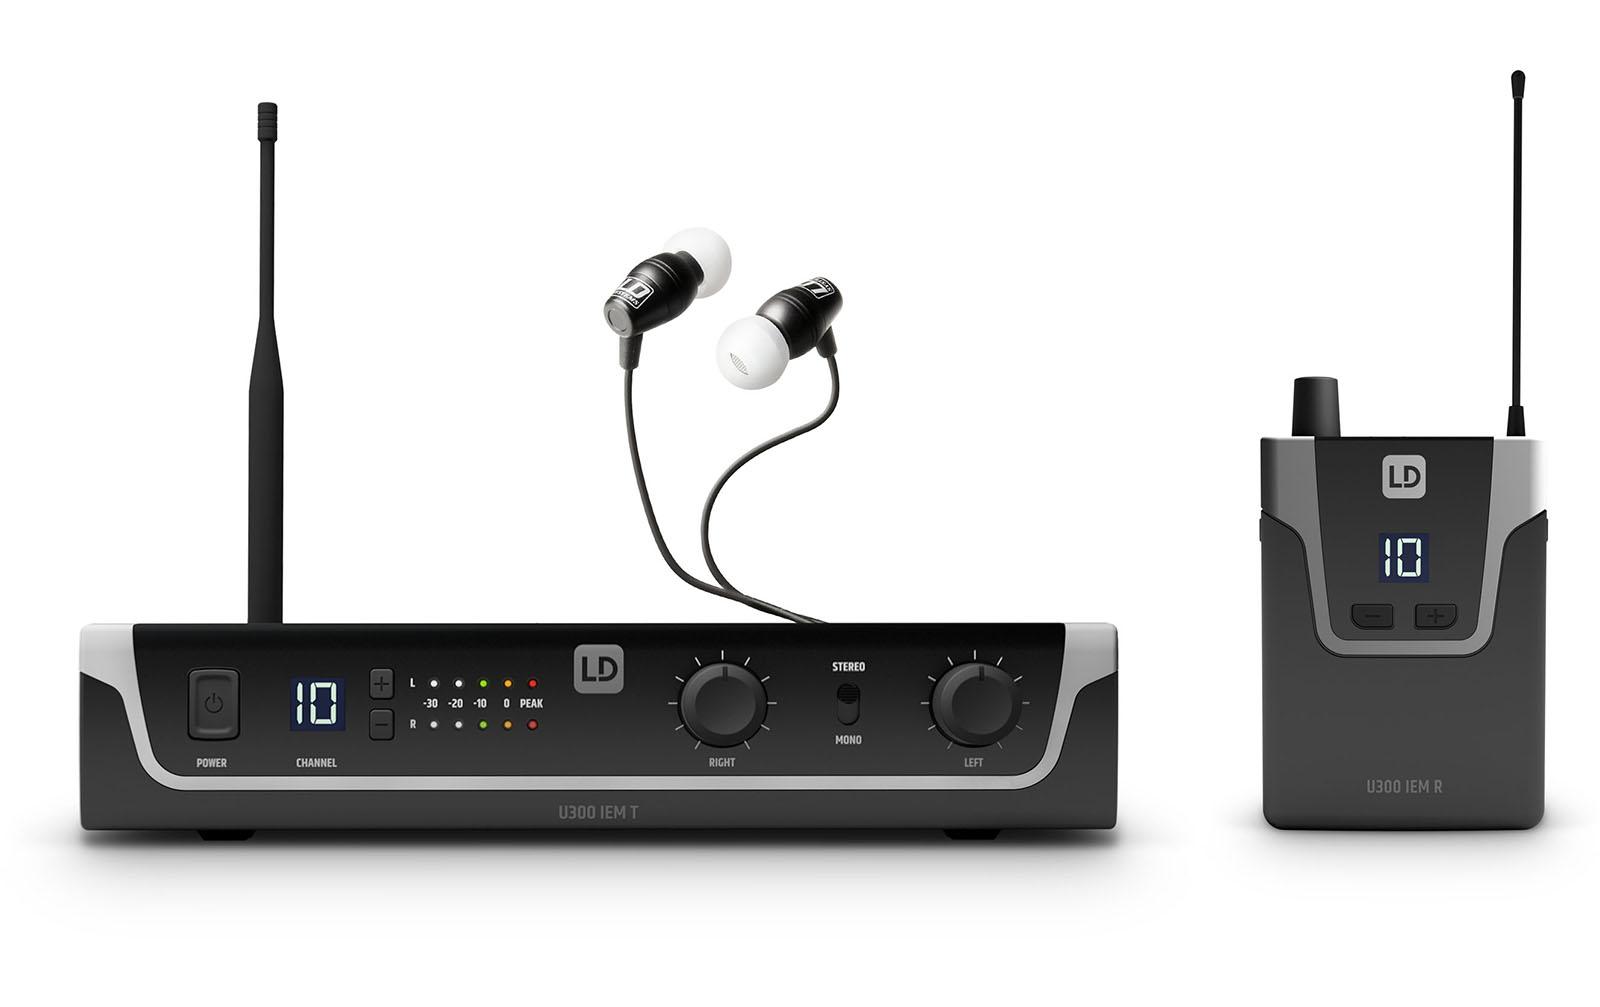 ld-systems-u305-1-iem-hp-in-ear-monitoring-system-mit-ohrha-rern